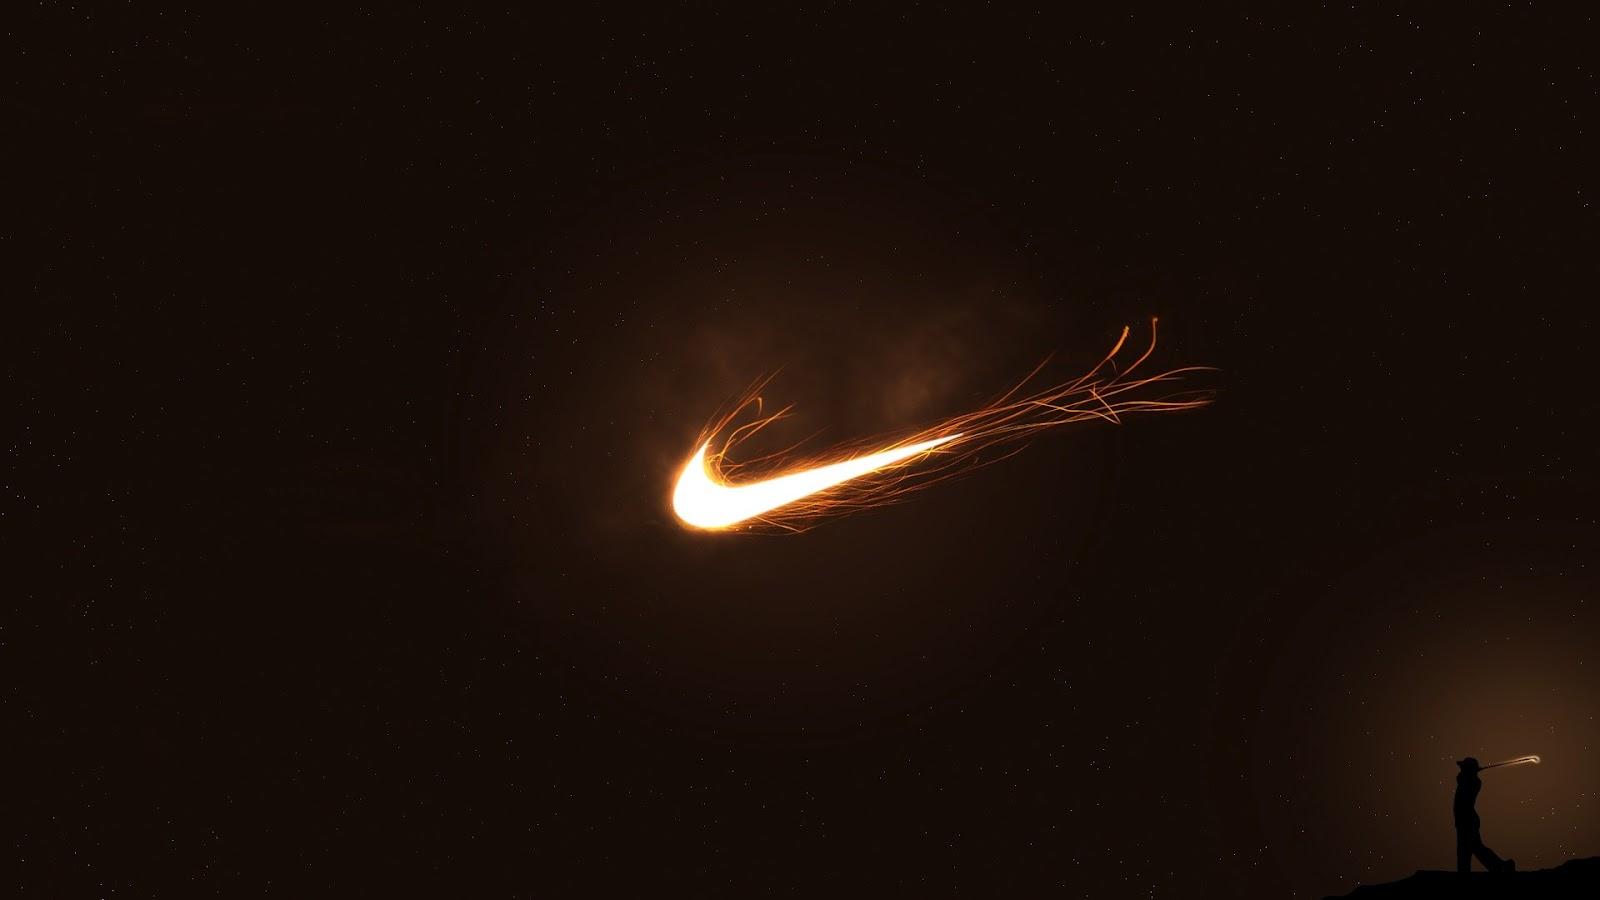 Nike Brand Logo Minimal HD Wallpapers Download Wallpapers in HD 1600x900